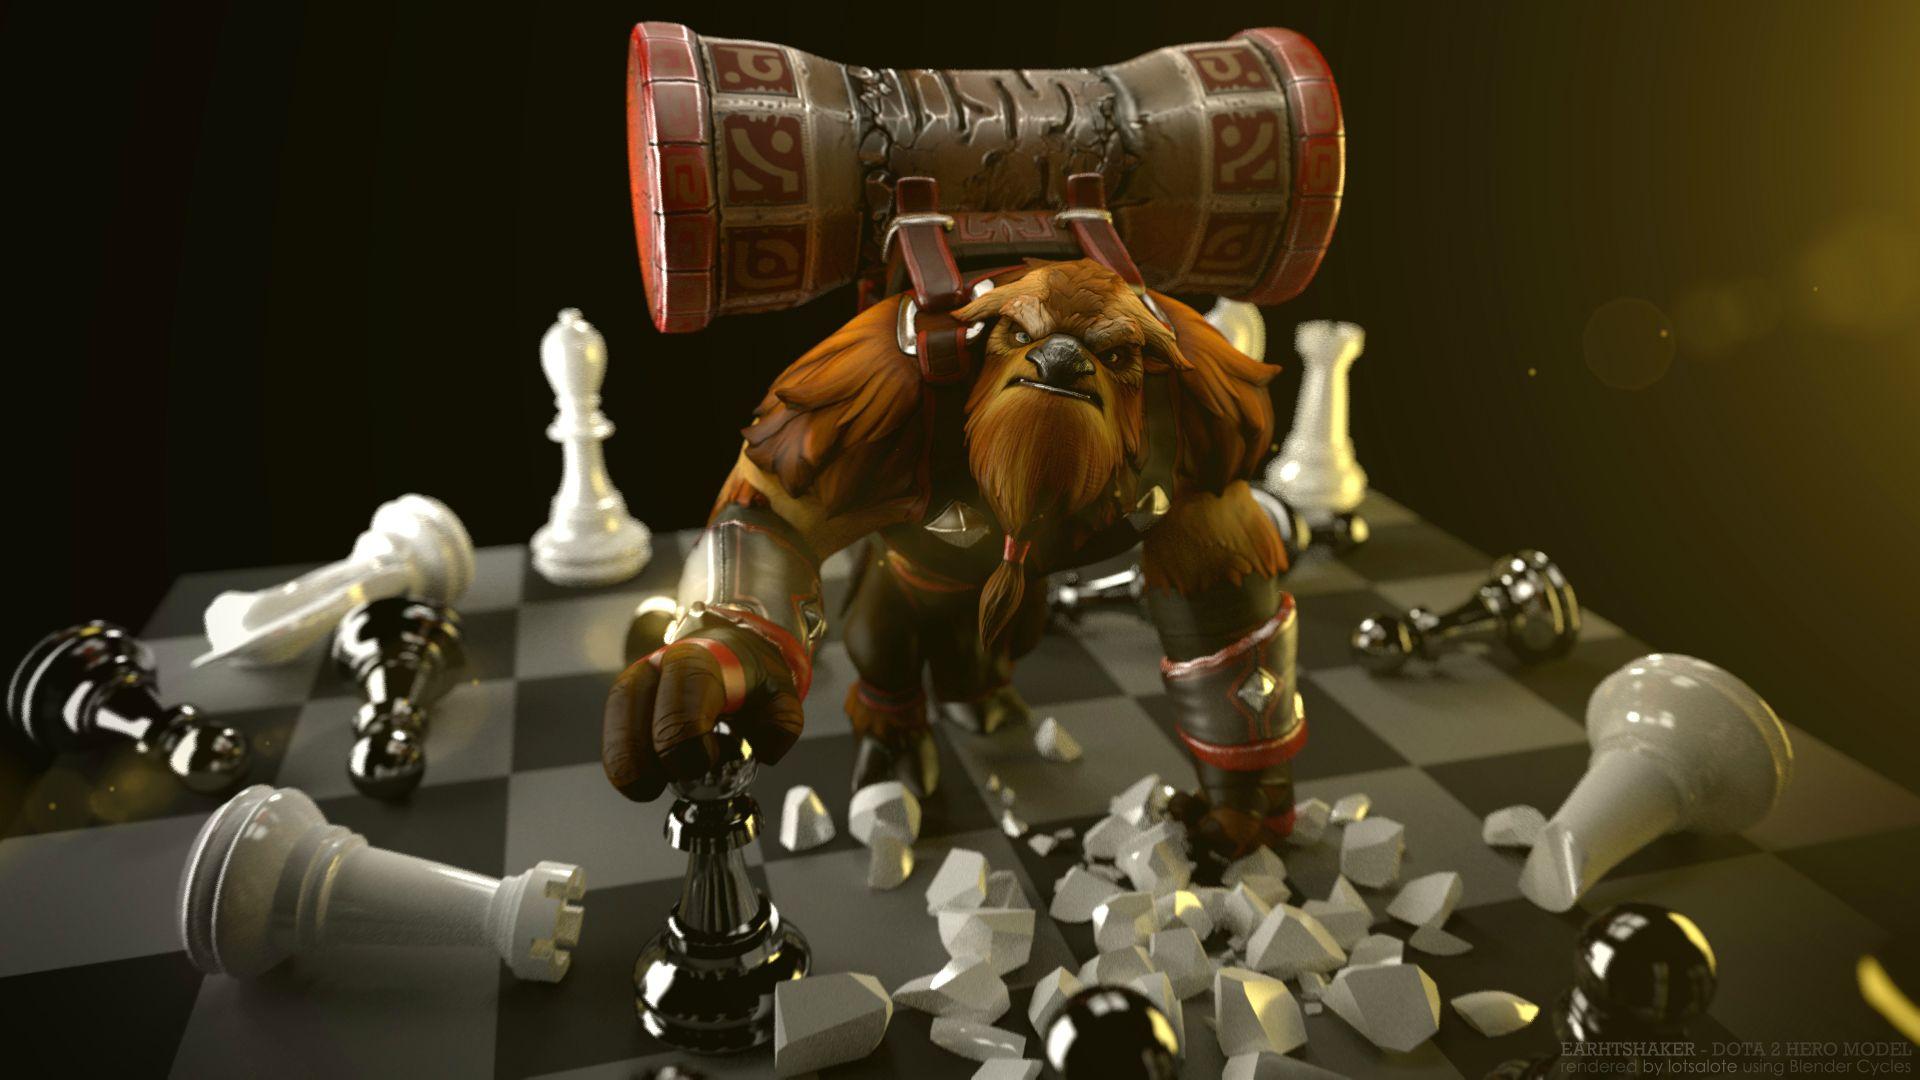 Earthshaker, Шейкер на шахматной доске wallpapers dota 2 Скачать